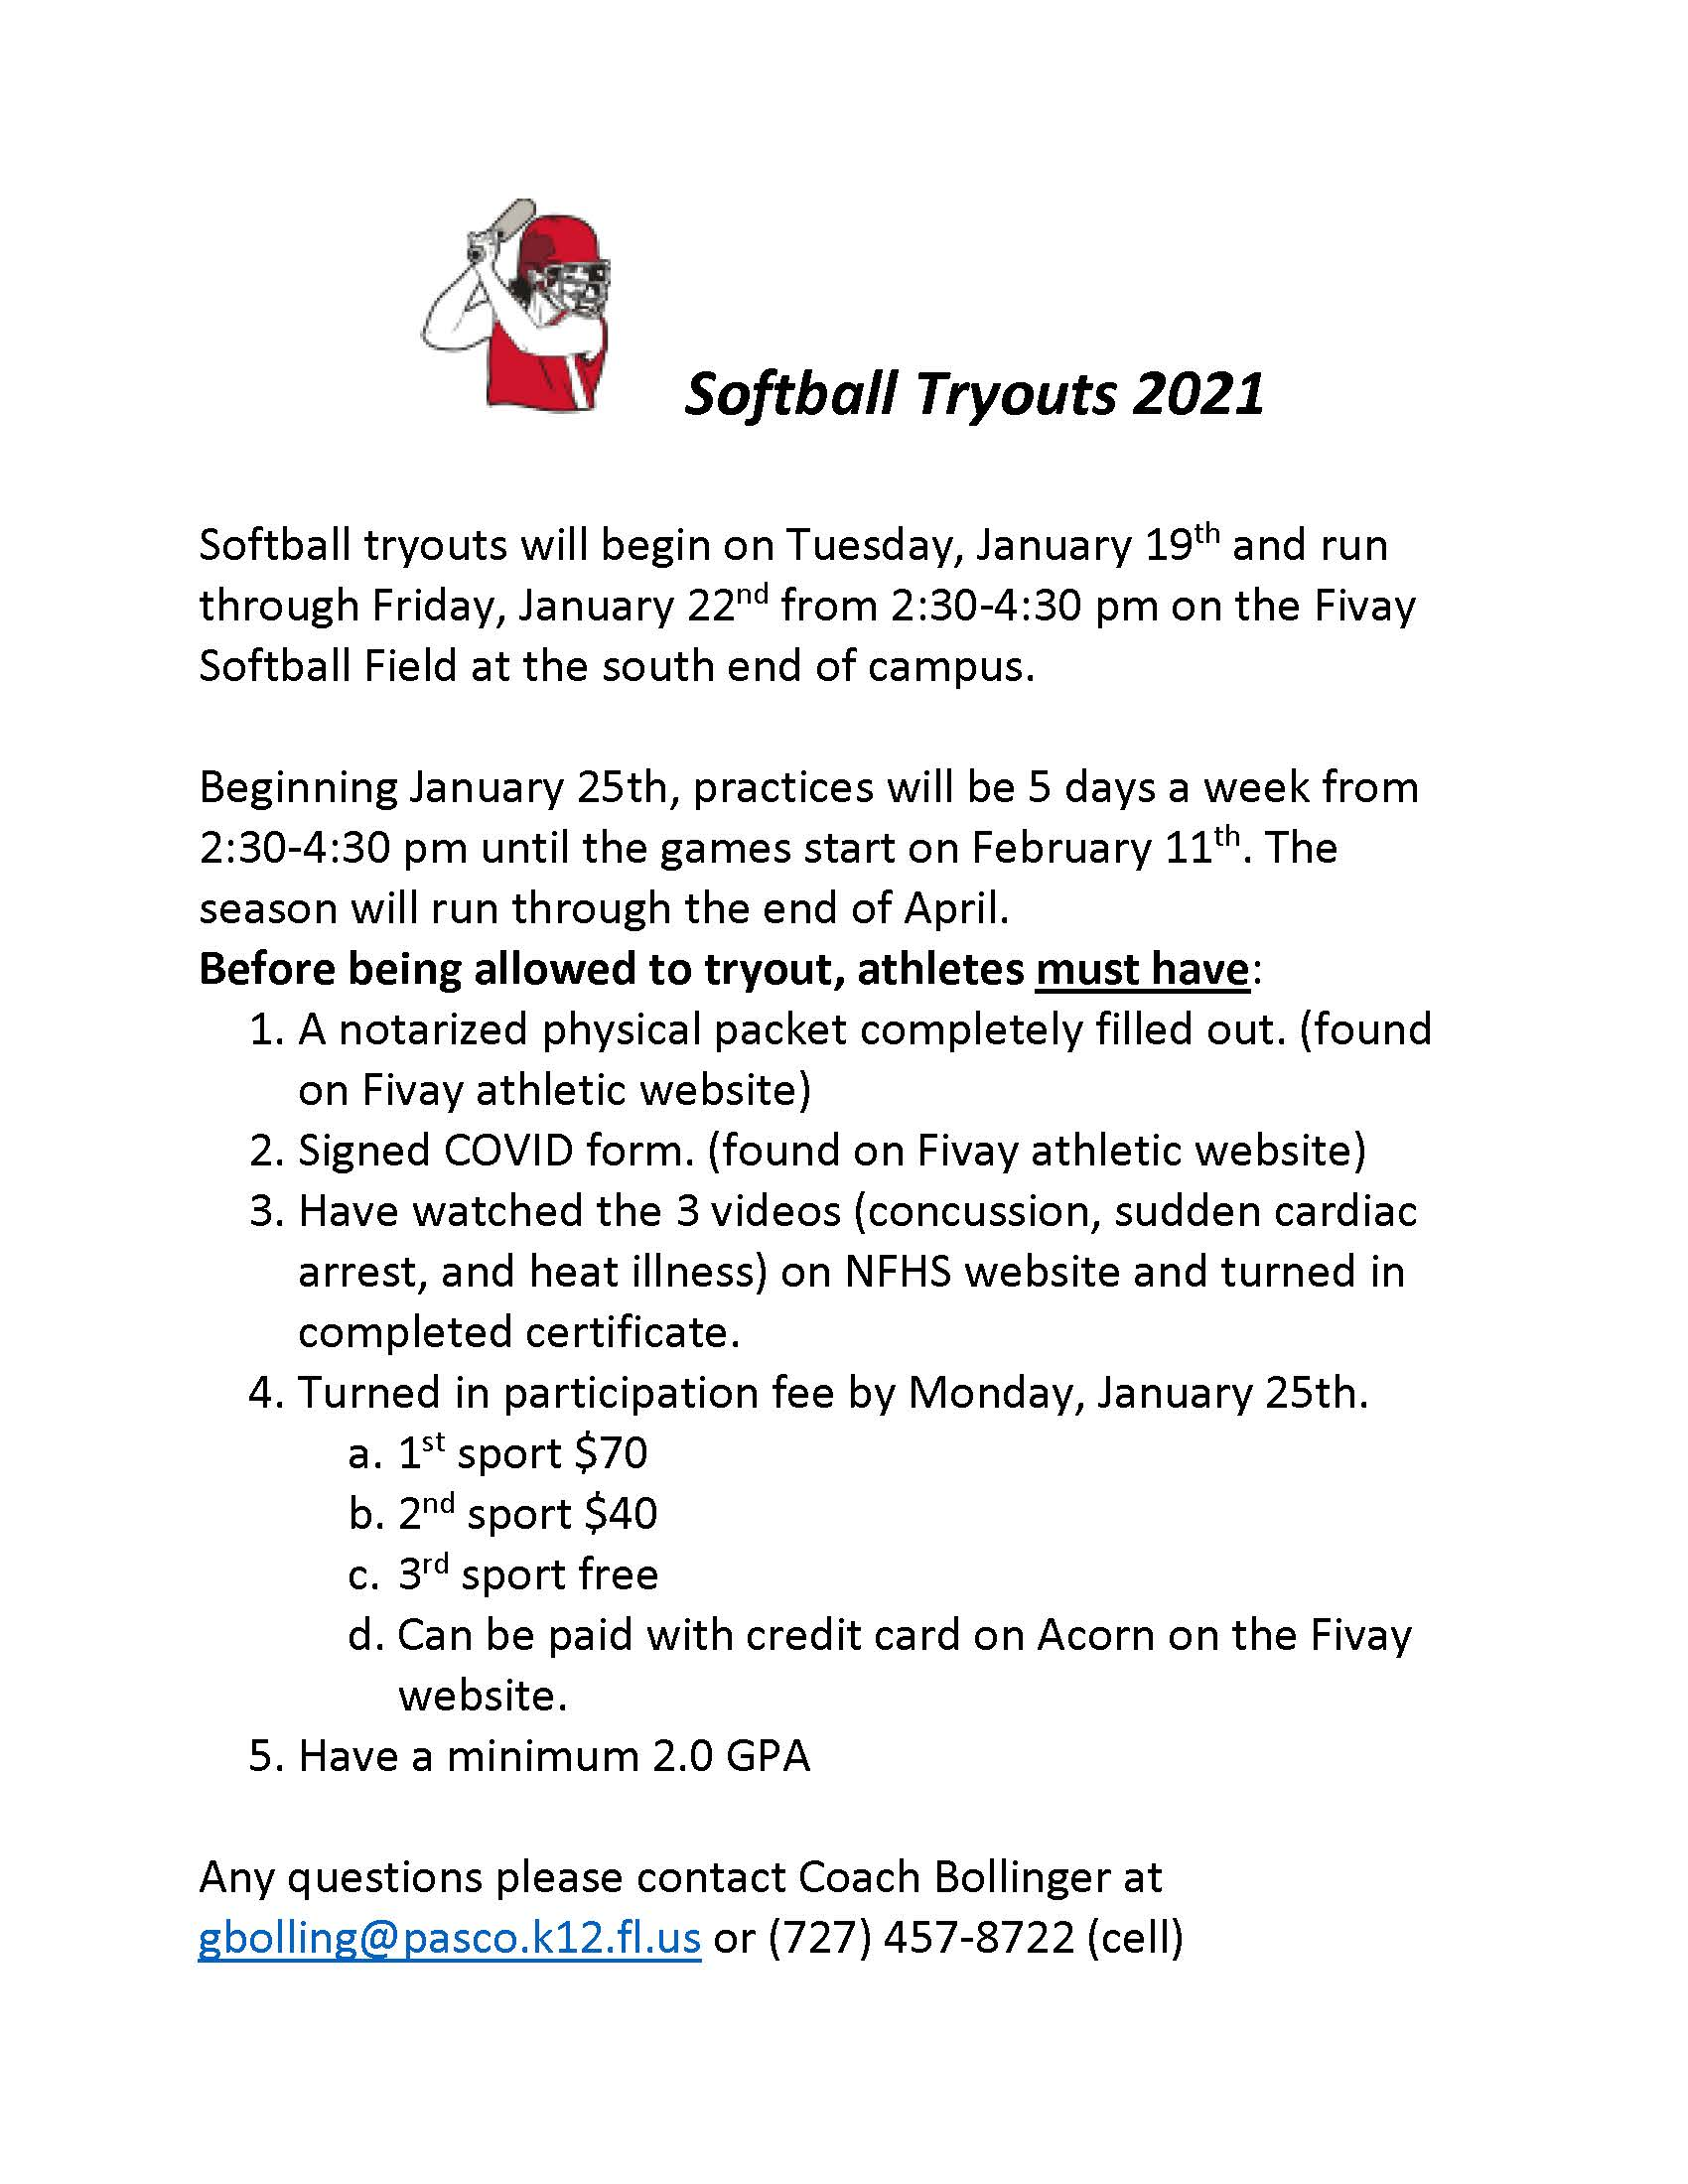 Zephyrhills vs Fivay - 2021 High School Football Live